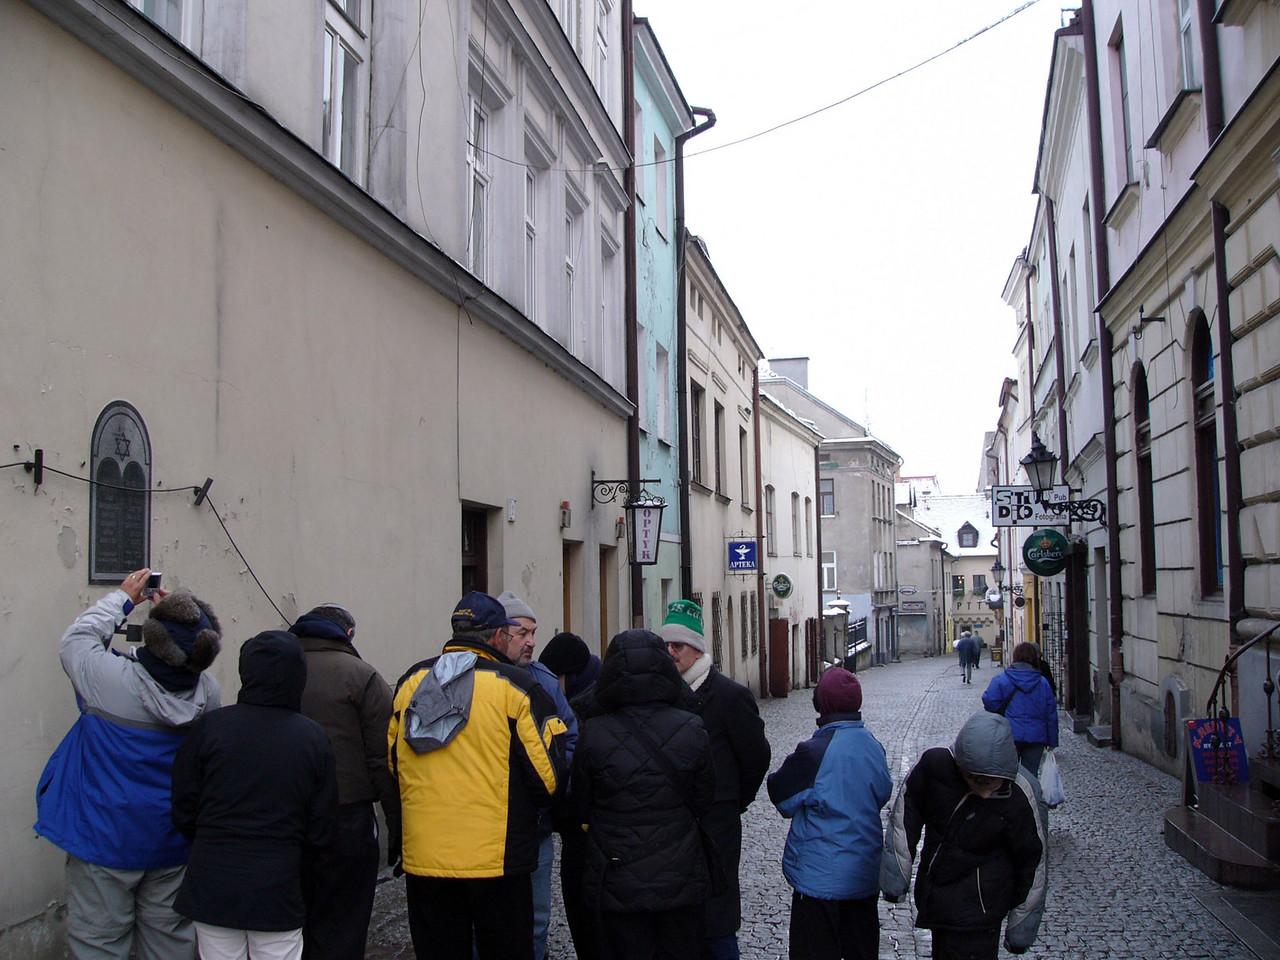 Street of the Jews, Tarnow